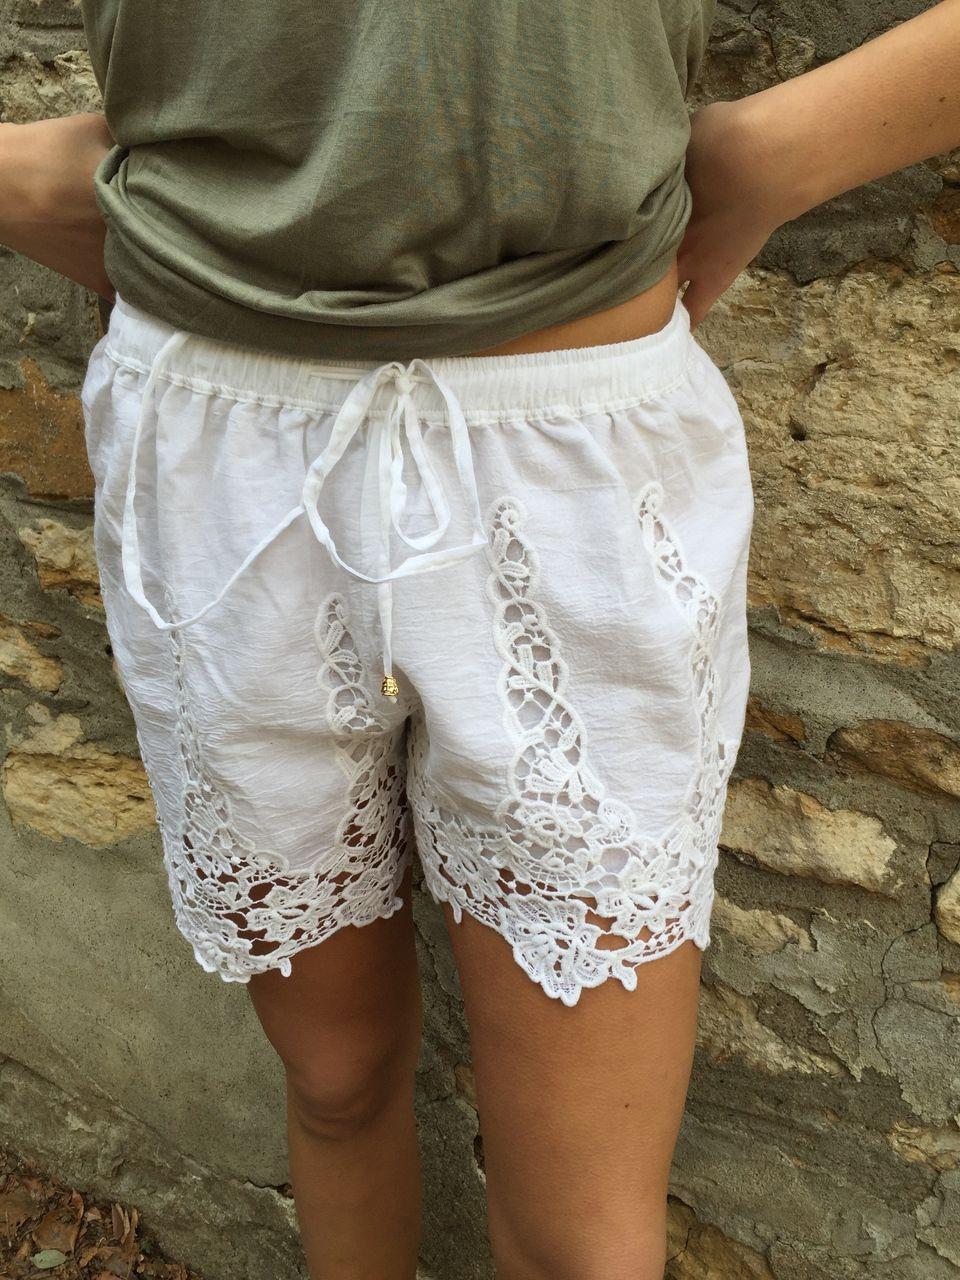 fortuityinc - Crochet Shorts::WHITE, $35.00 (http://www.fortuityusa.com/crochet-shorts-white/)